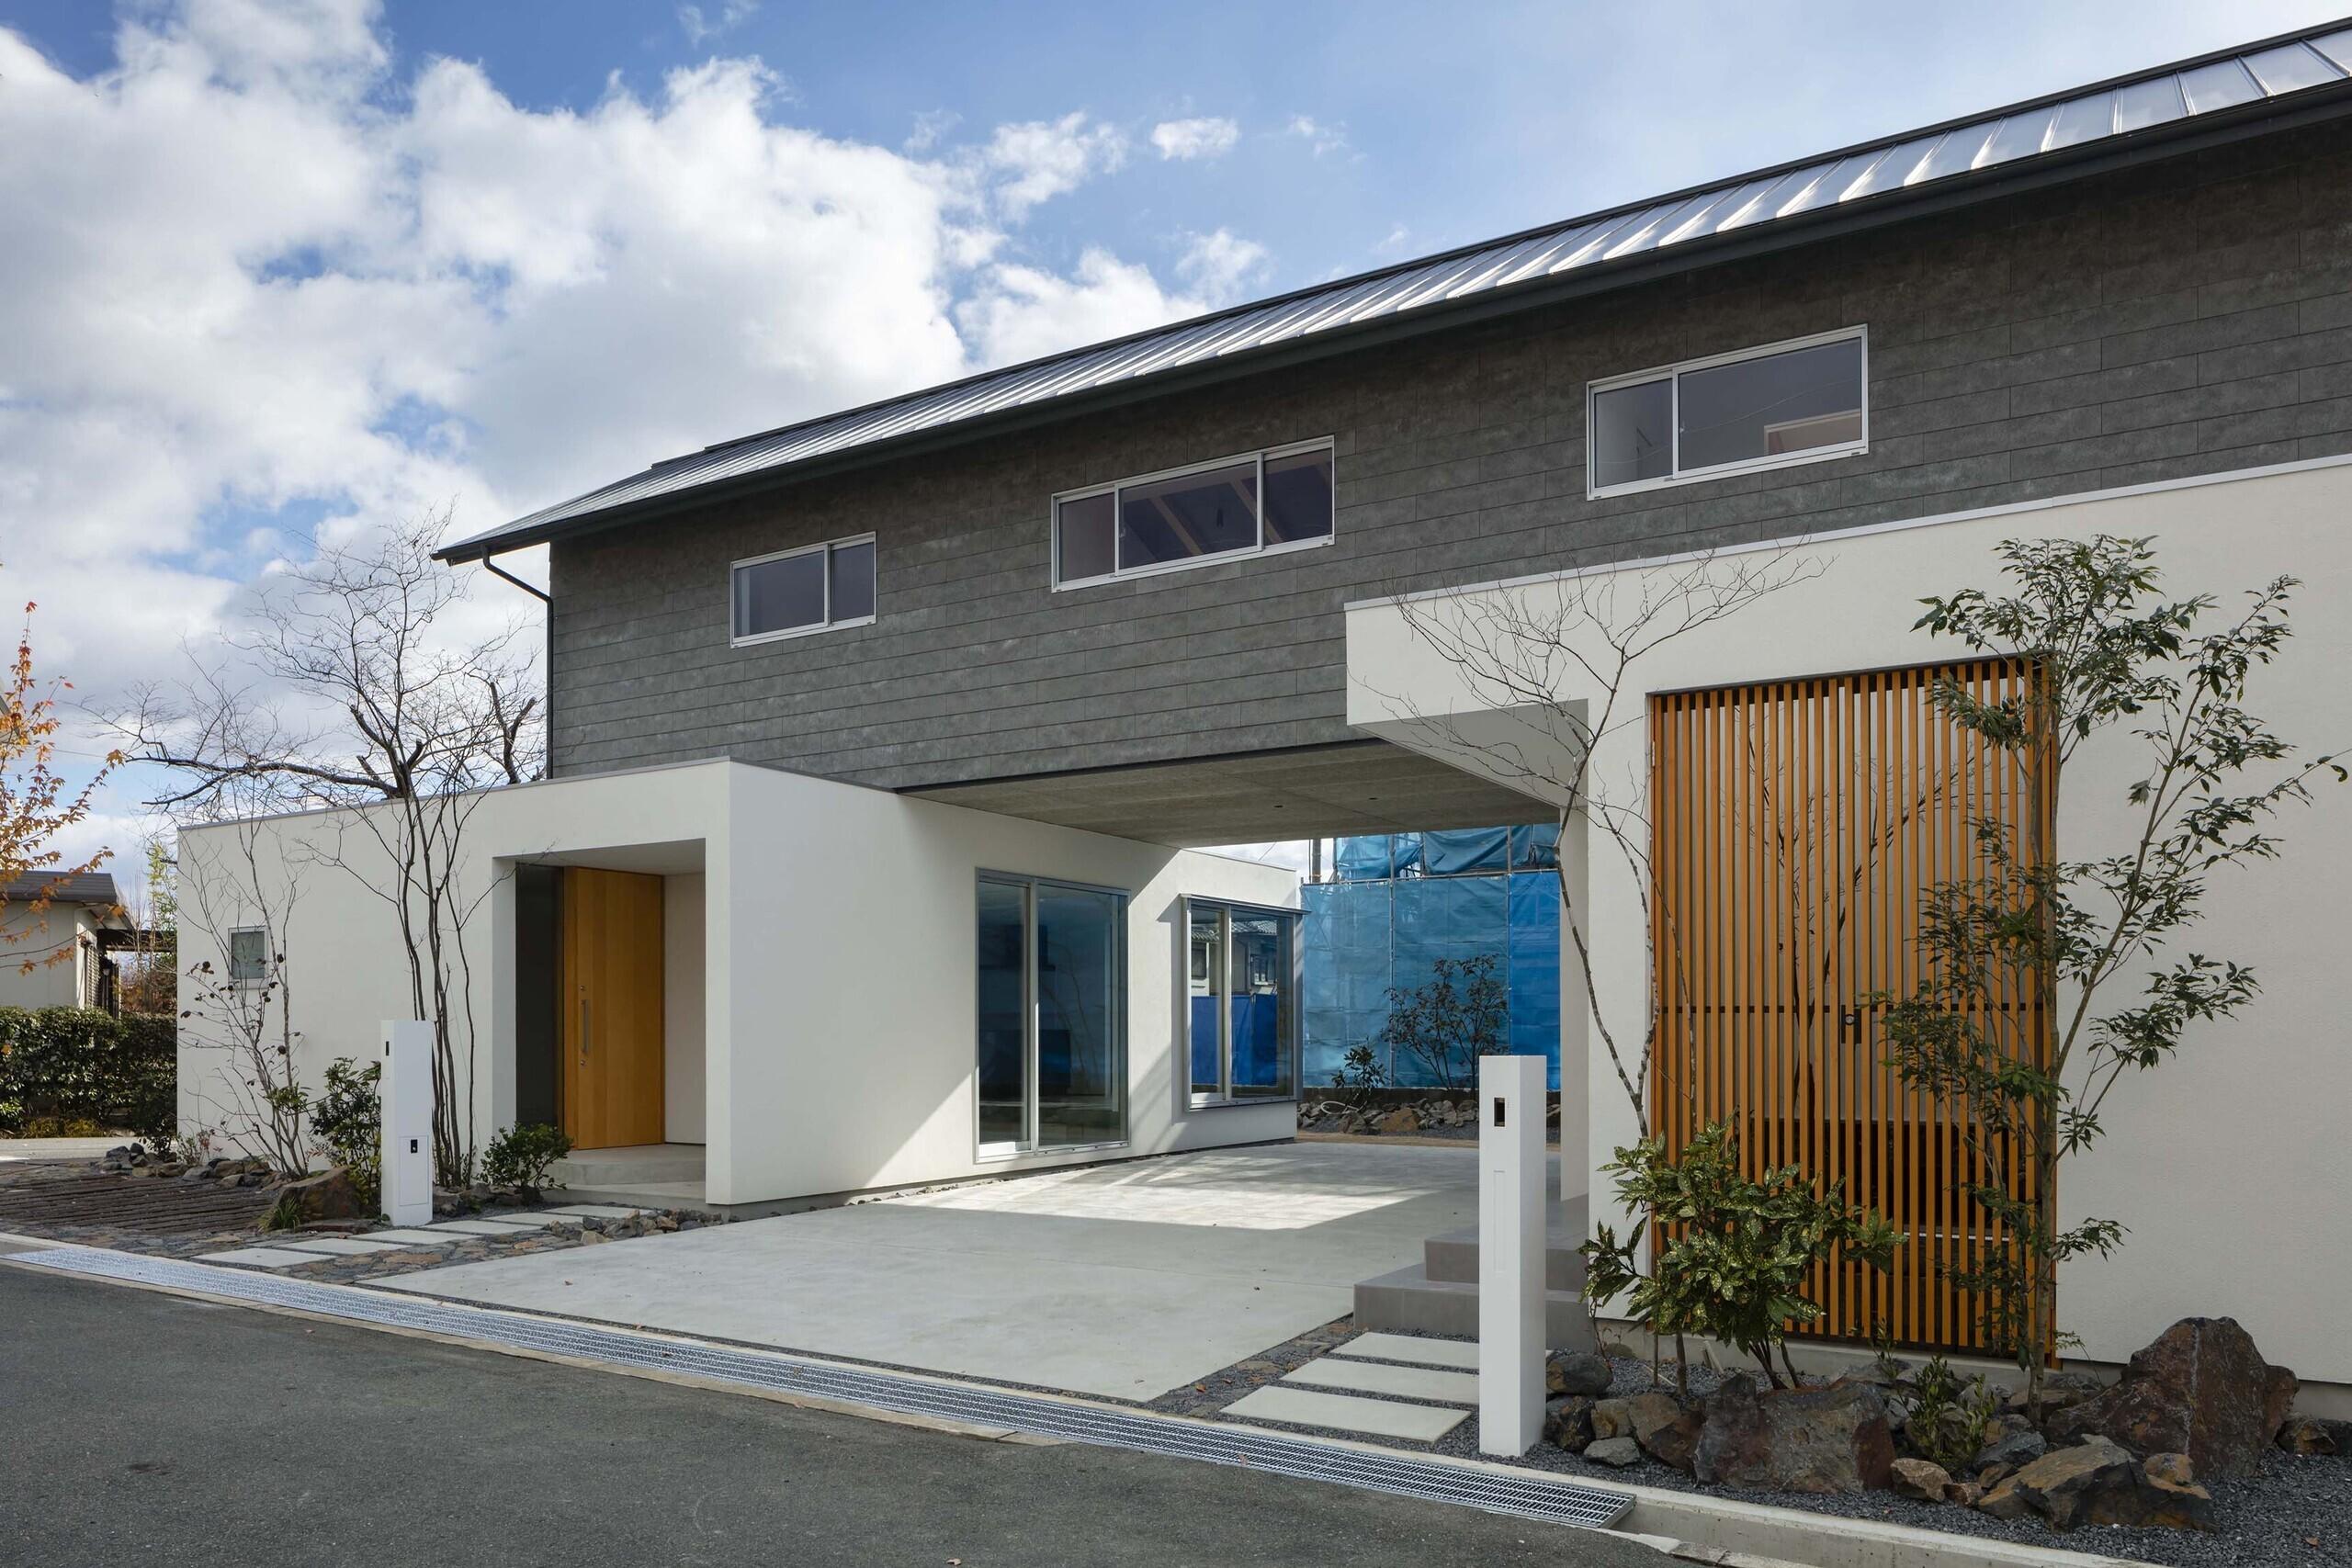 池田の家(二世帯住宅)の建築事例写真